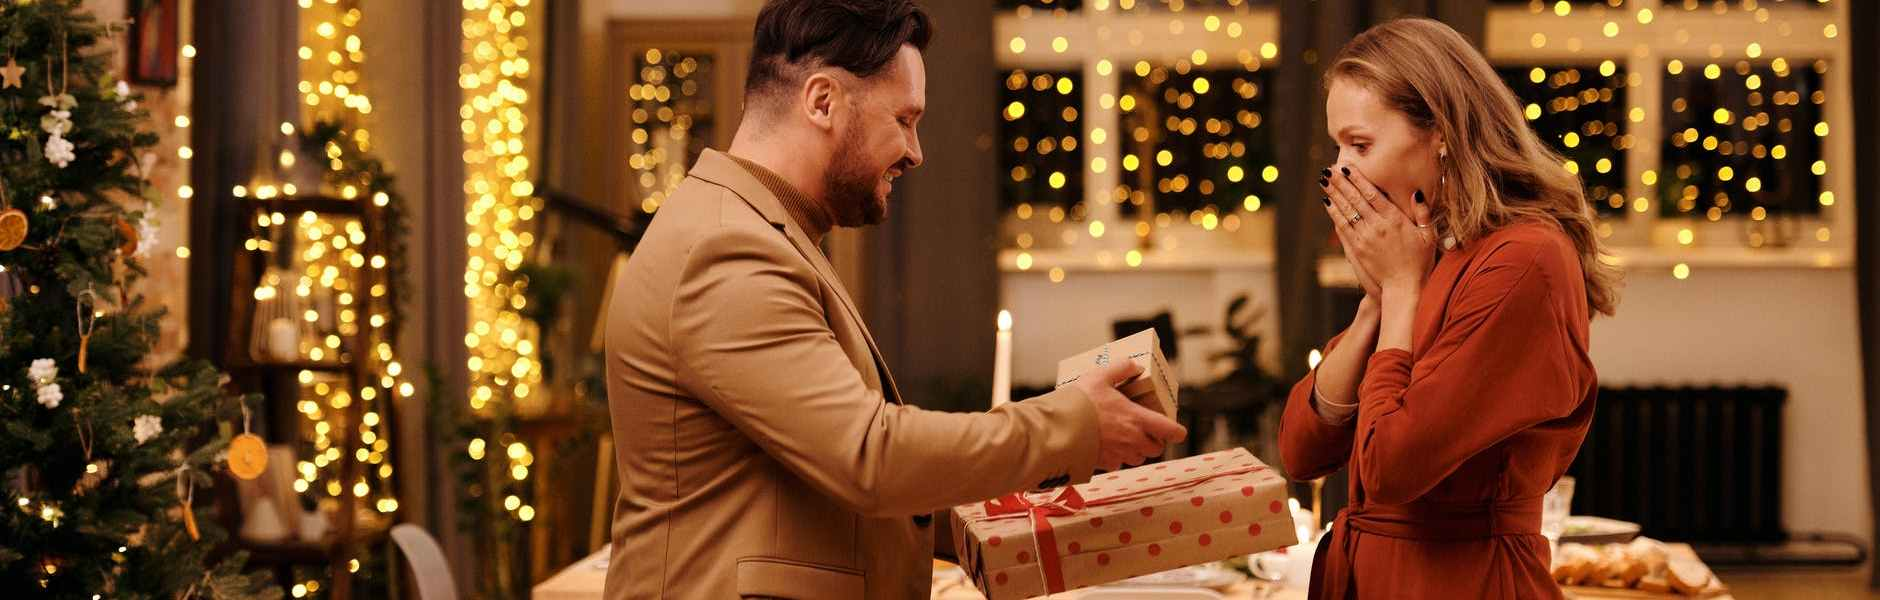 Znate li kako izgleda savršen poklon?, man giving christmas presents to his wife